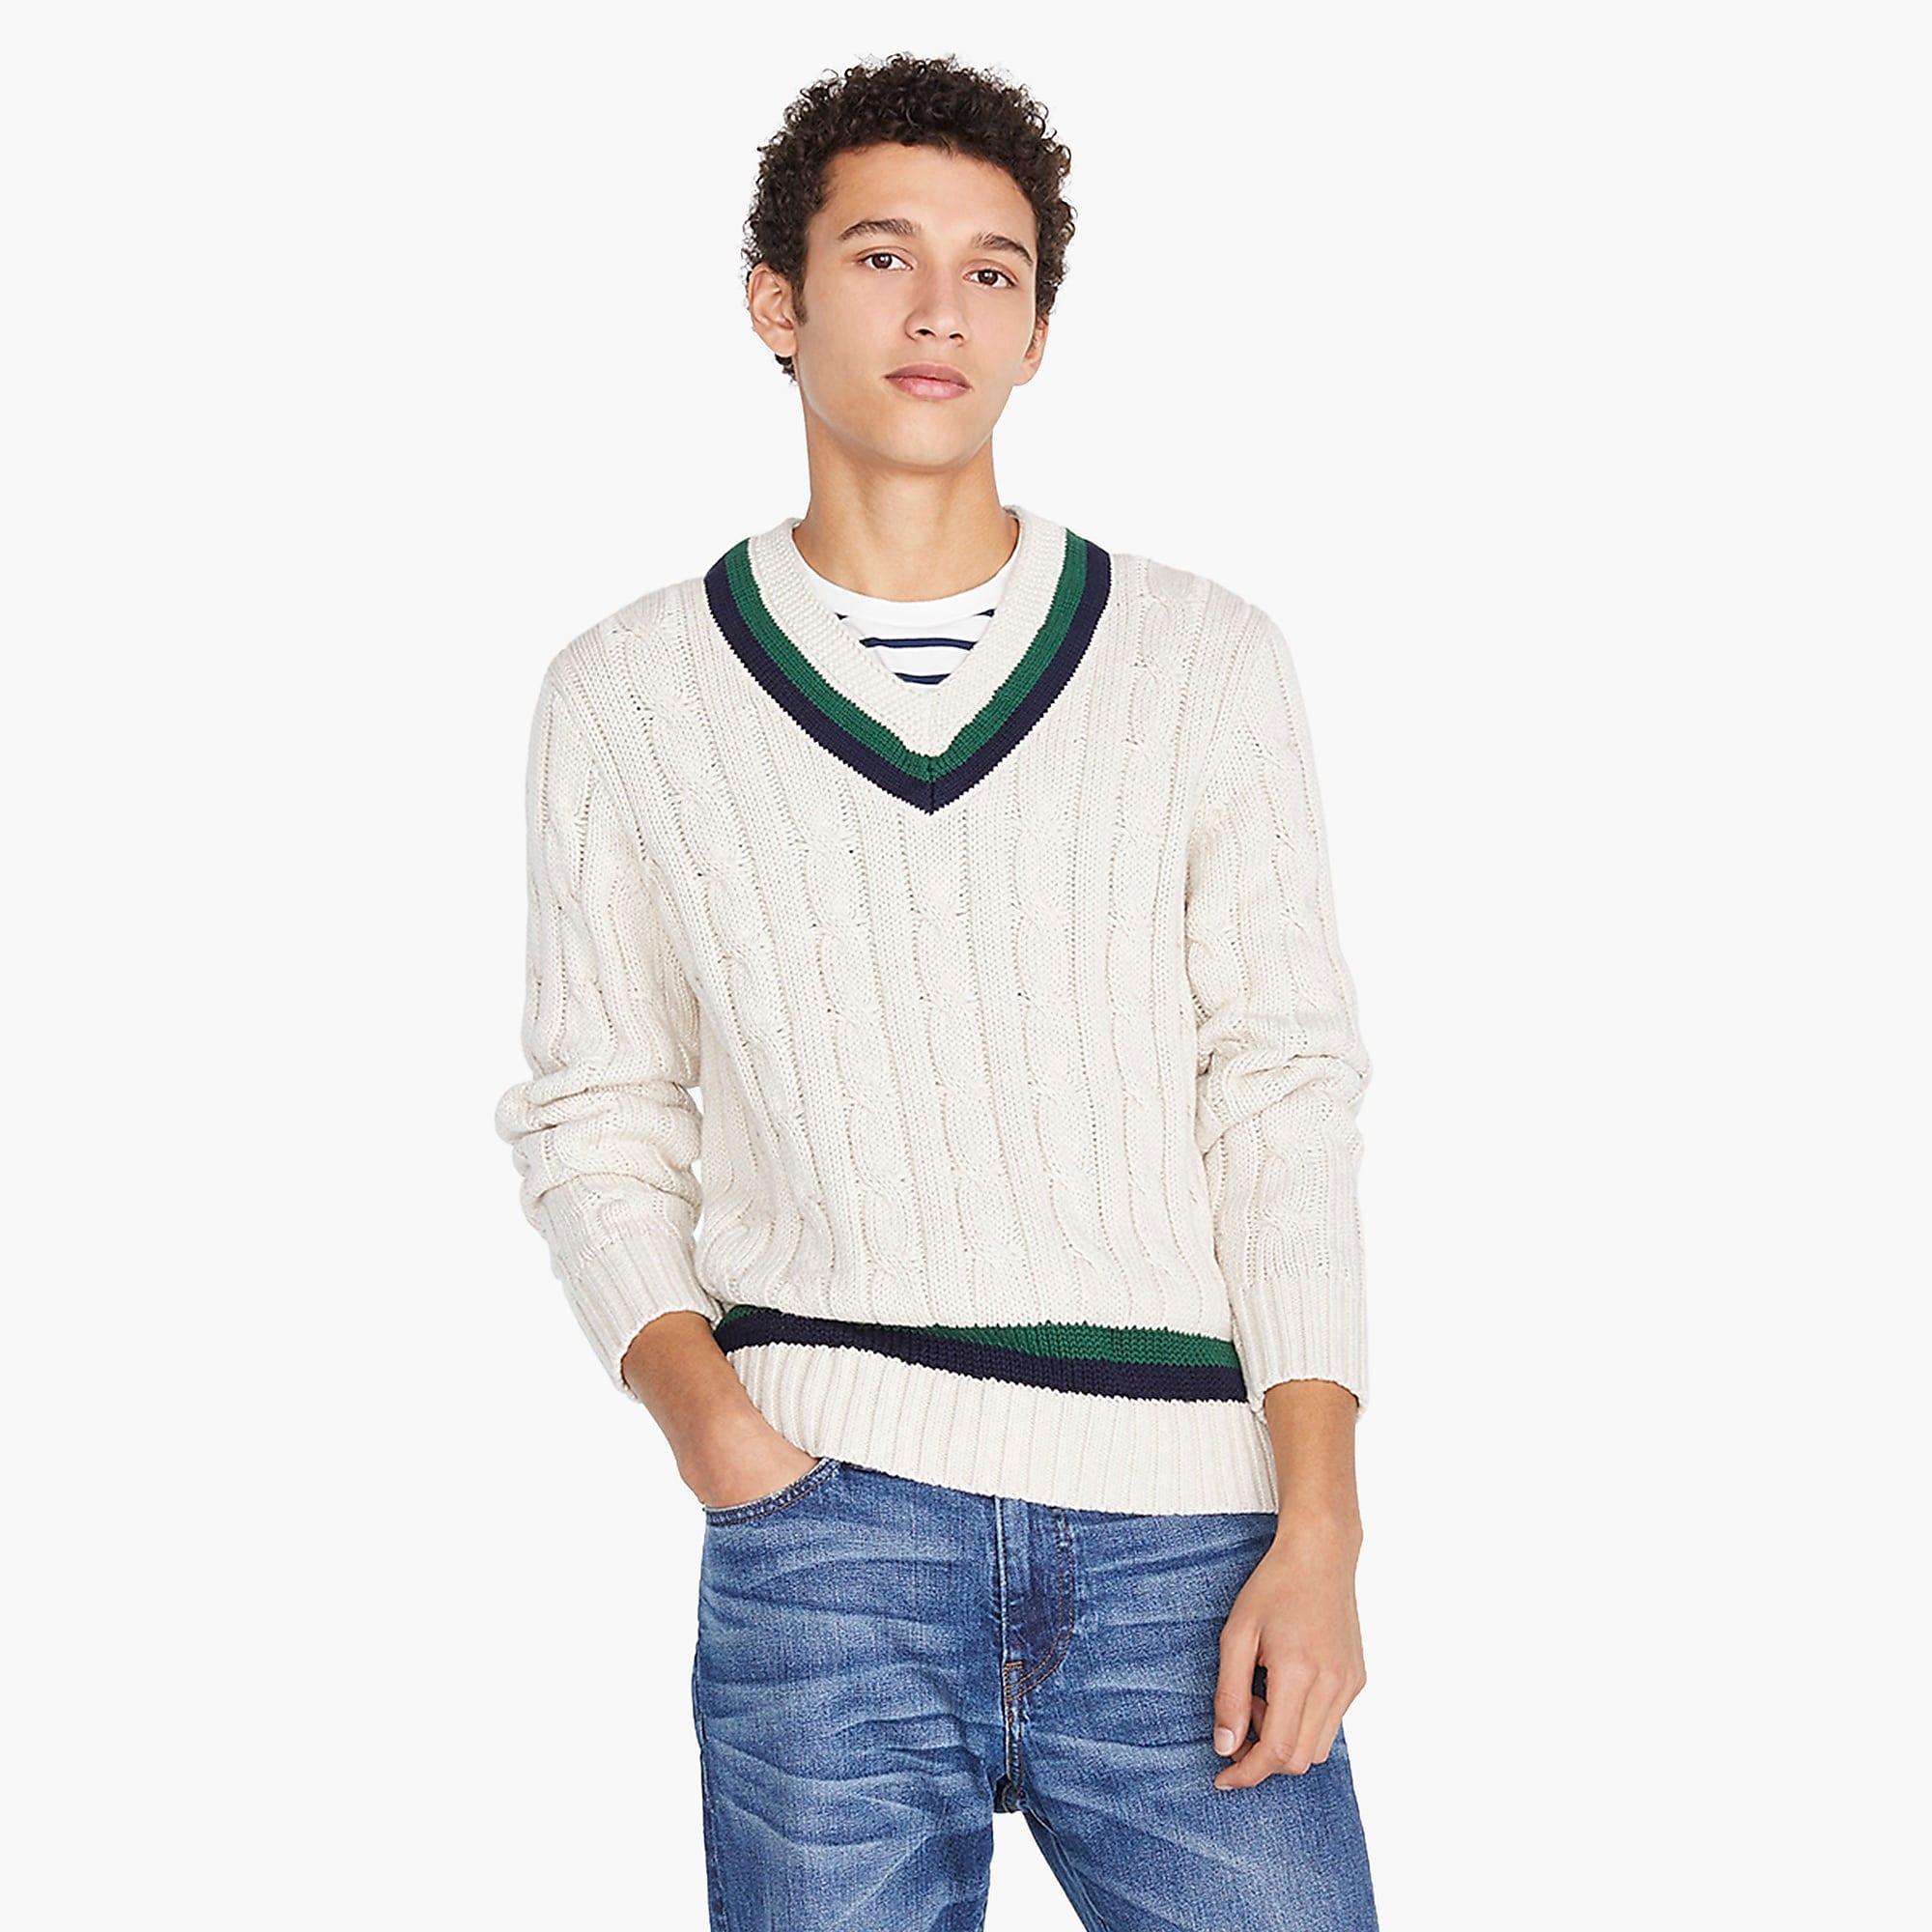 J Crew Always Cotton Tennis Sweater For Men Lyst